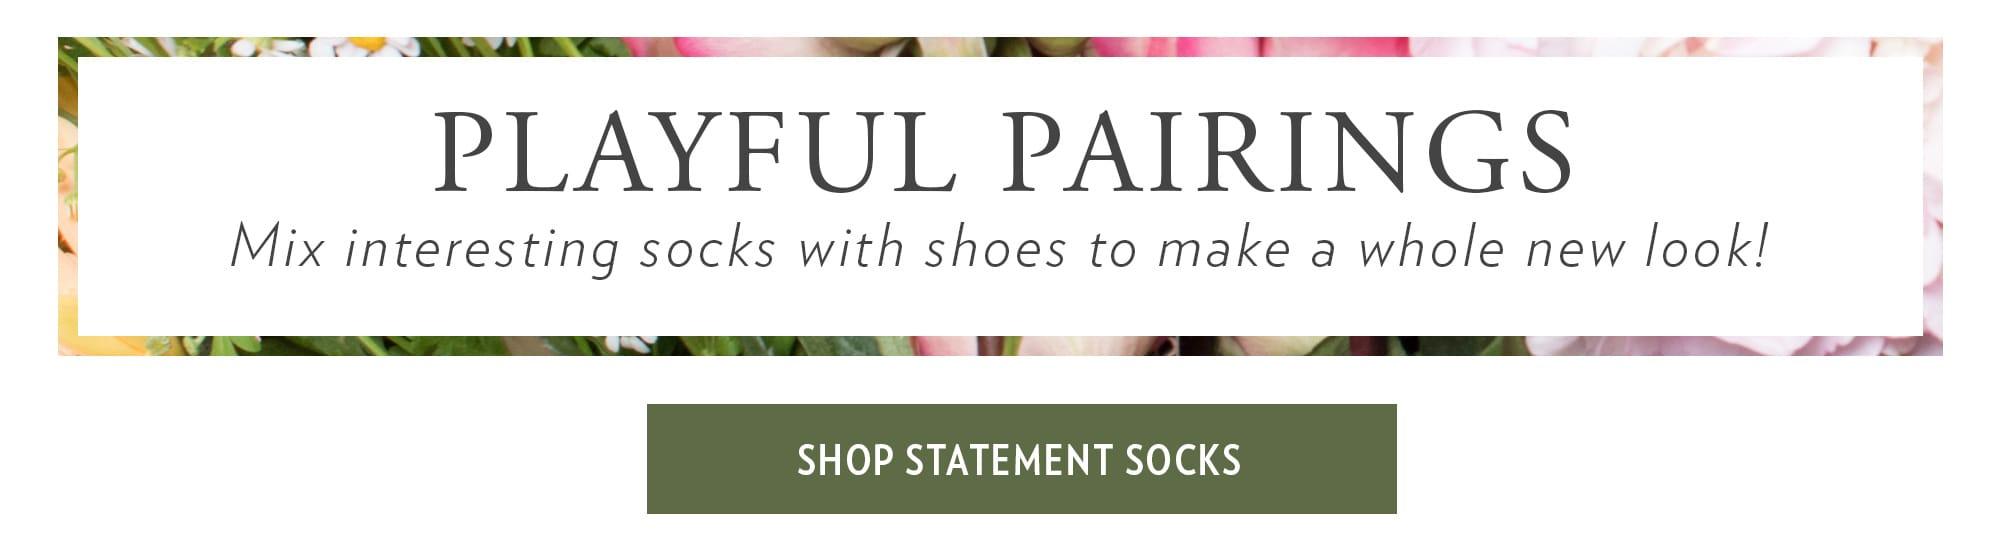 Shop Statement Socks